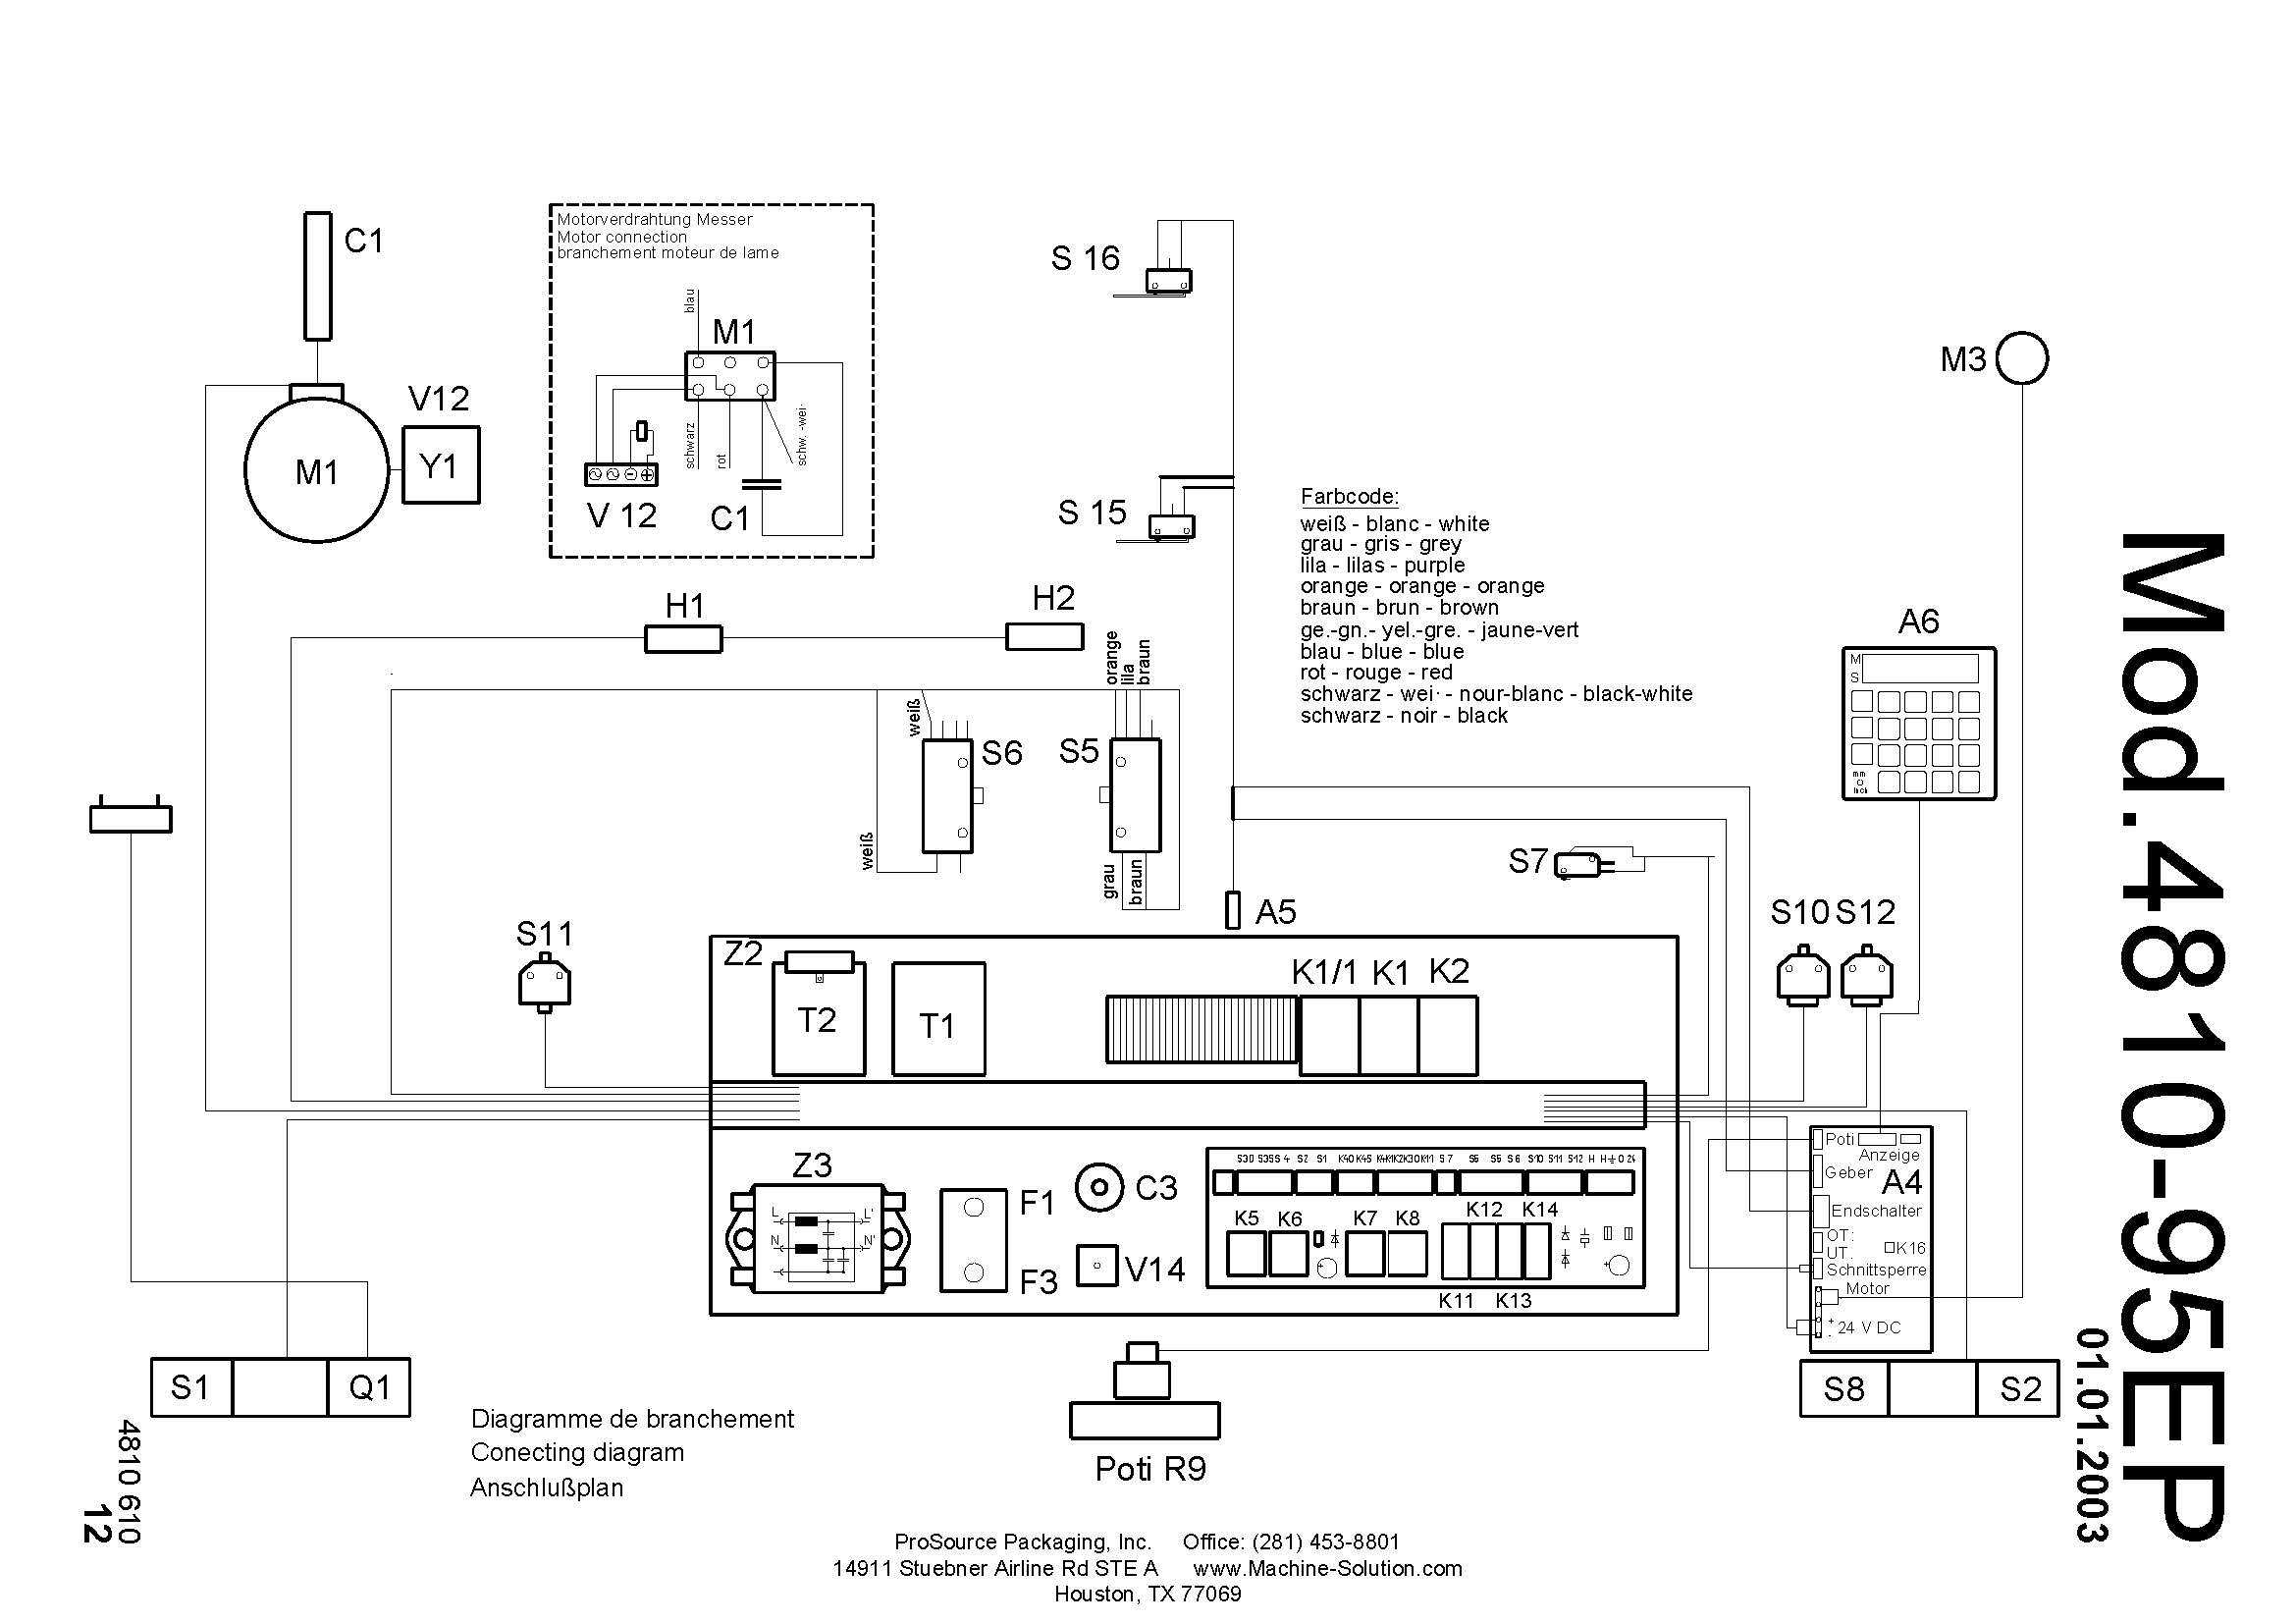 parts assistant mbm triumph 4810 95 ep paper cutter rh machine solution com Guillotine Info Parts of a Guillotine